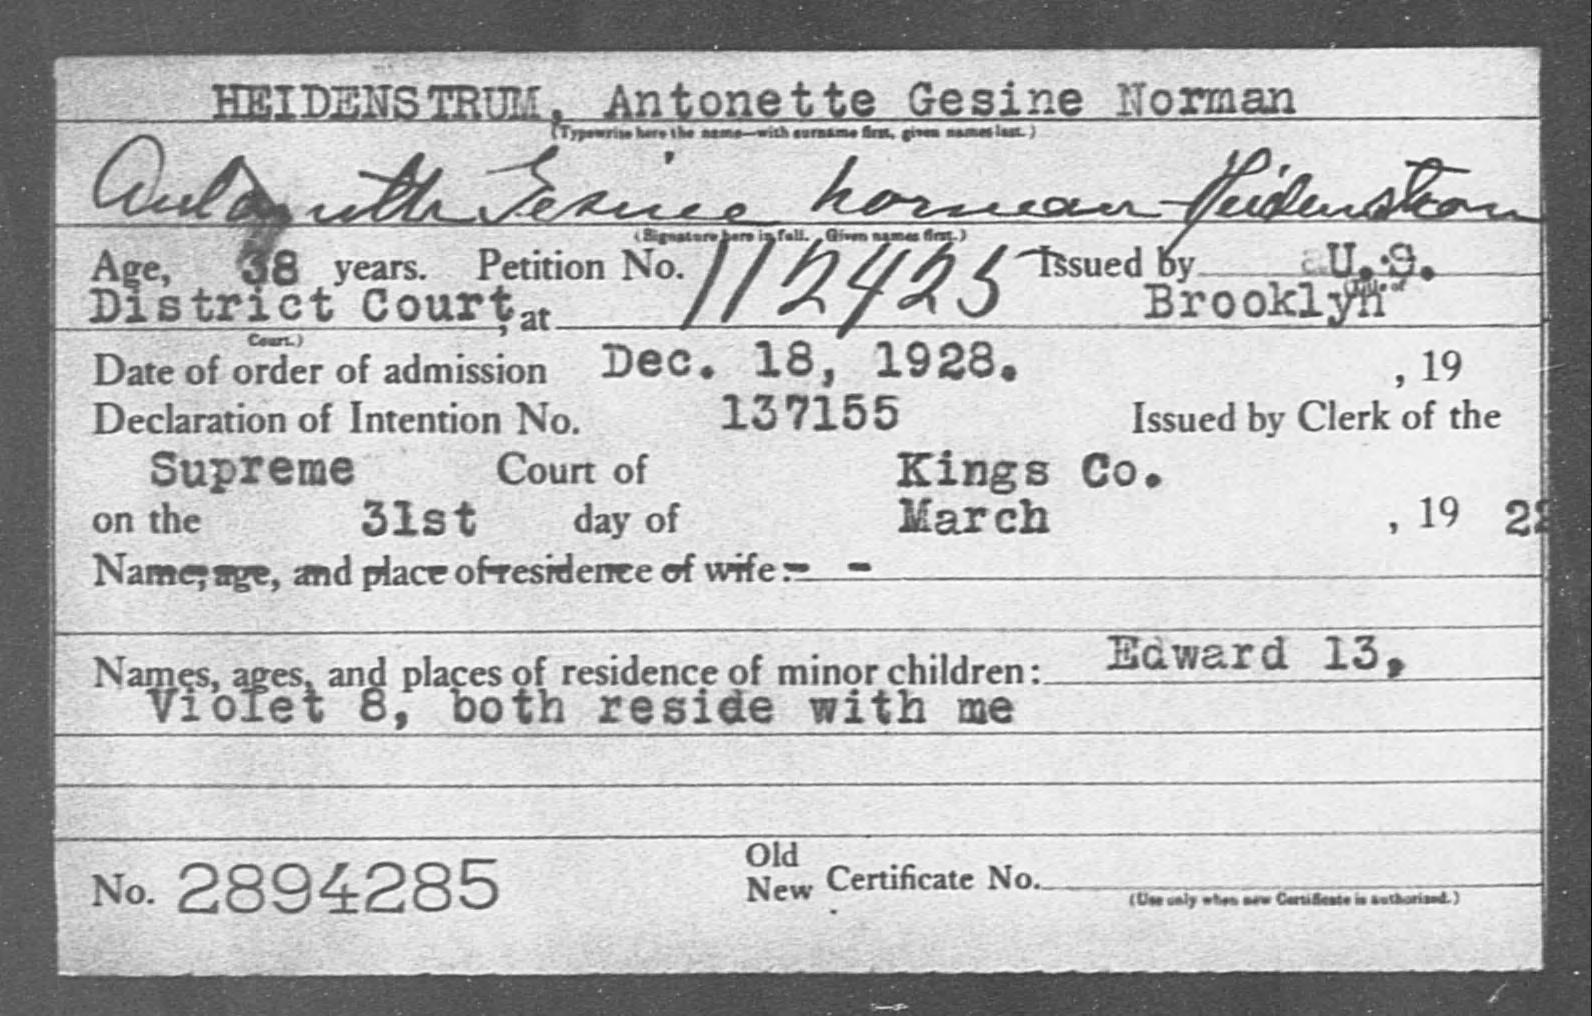 HEIDENSTRUM, Antonette Gesine Norman - Born: [BLANK], Naturalized: 1928